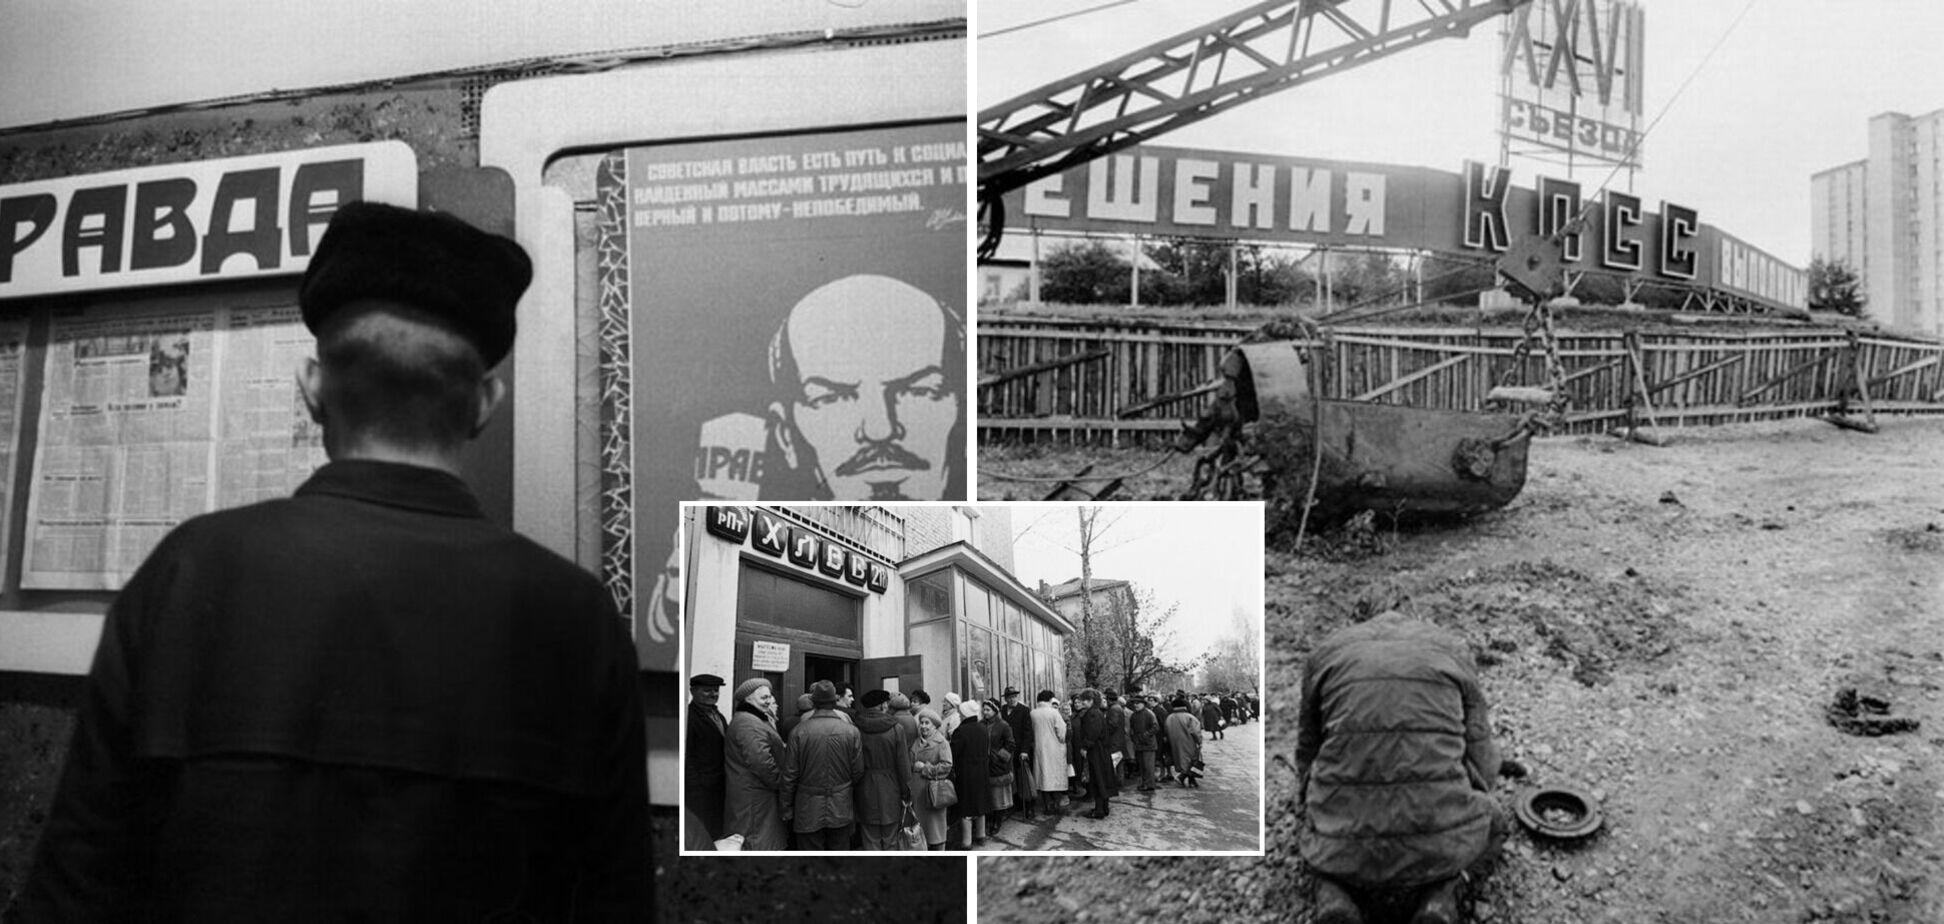 Настоящий СССР на фото 1980-х